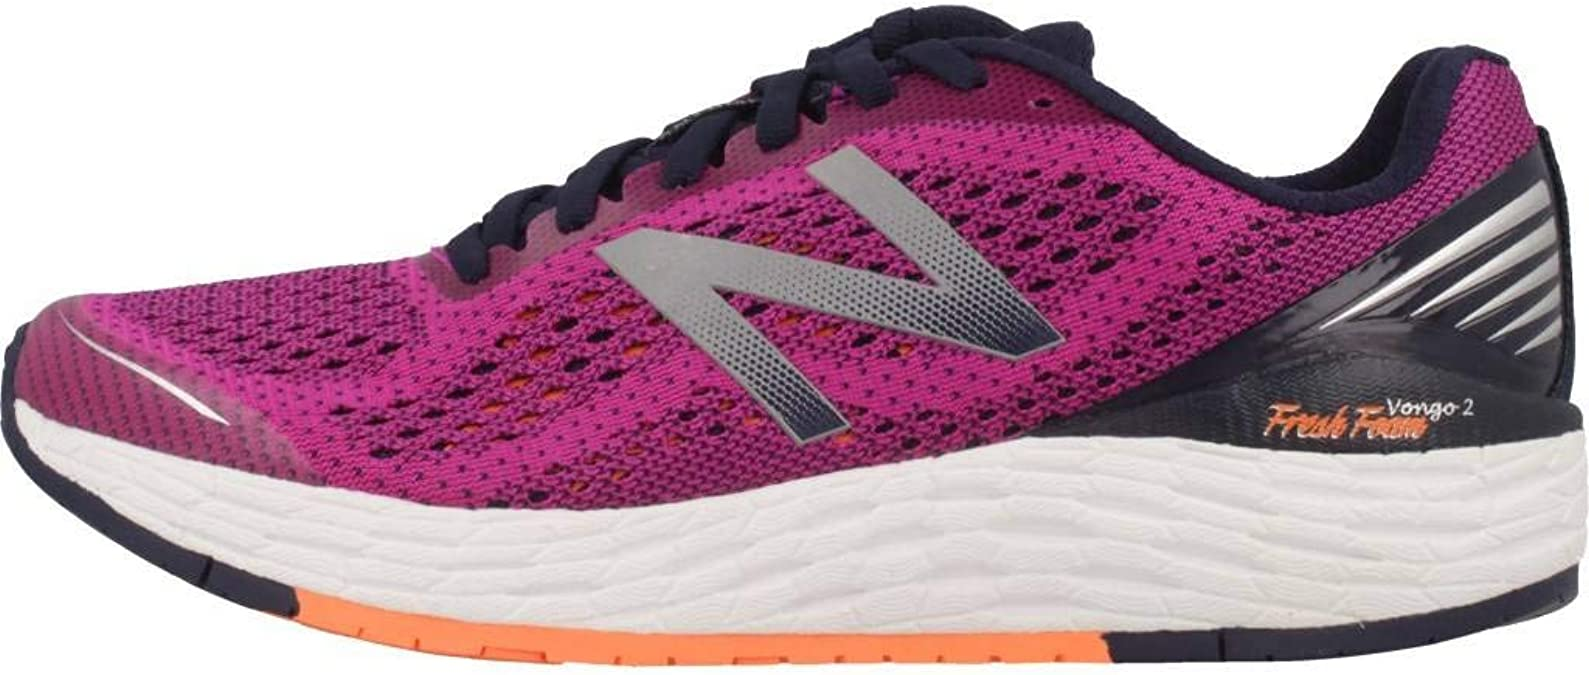 New Balance Damen Fresh Foam Vongo V2 Laufschuhe Amazon De Schuhe Handtaschen